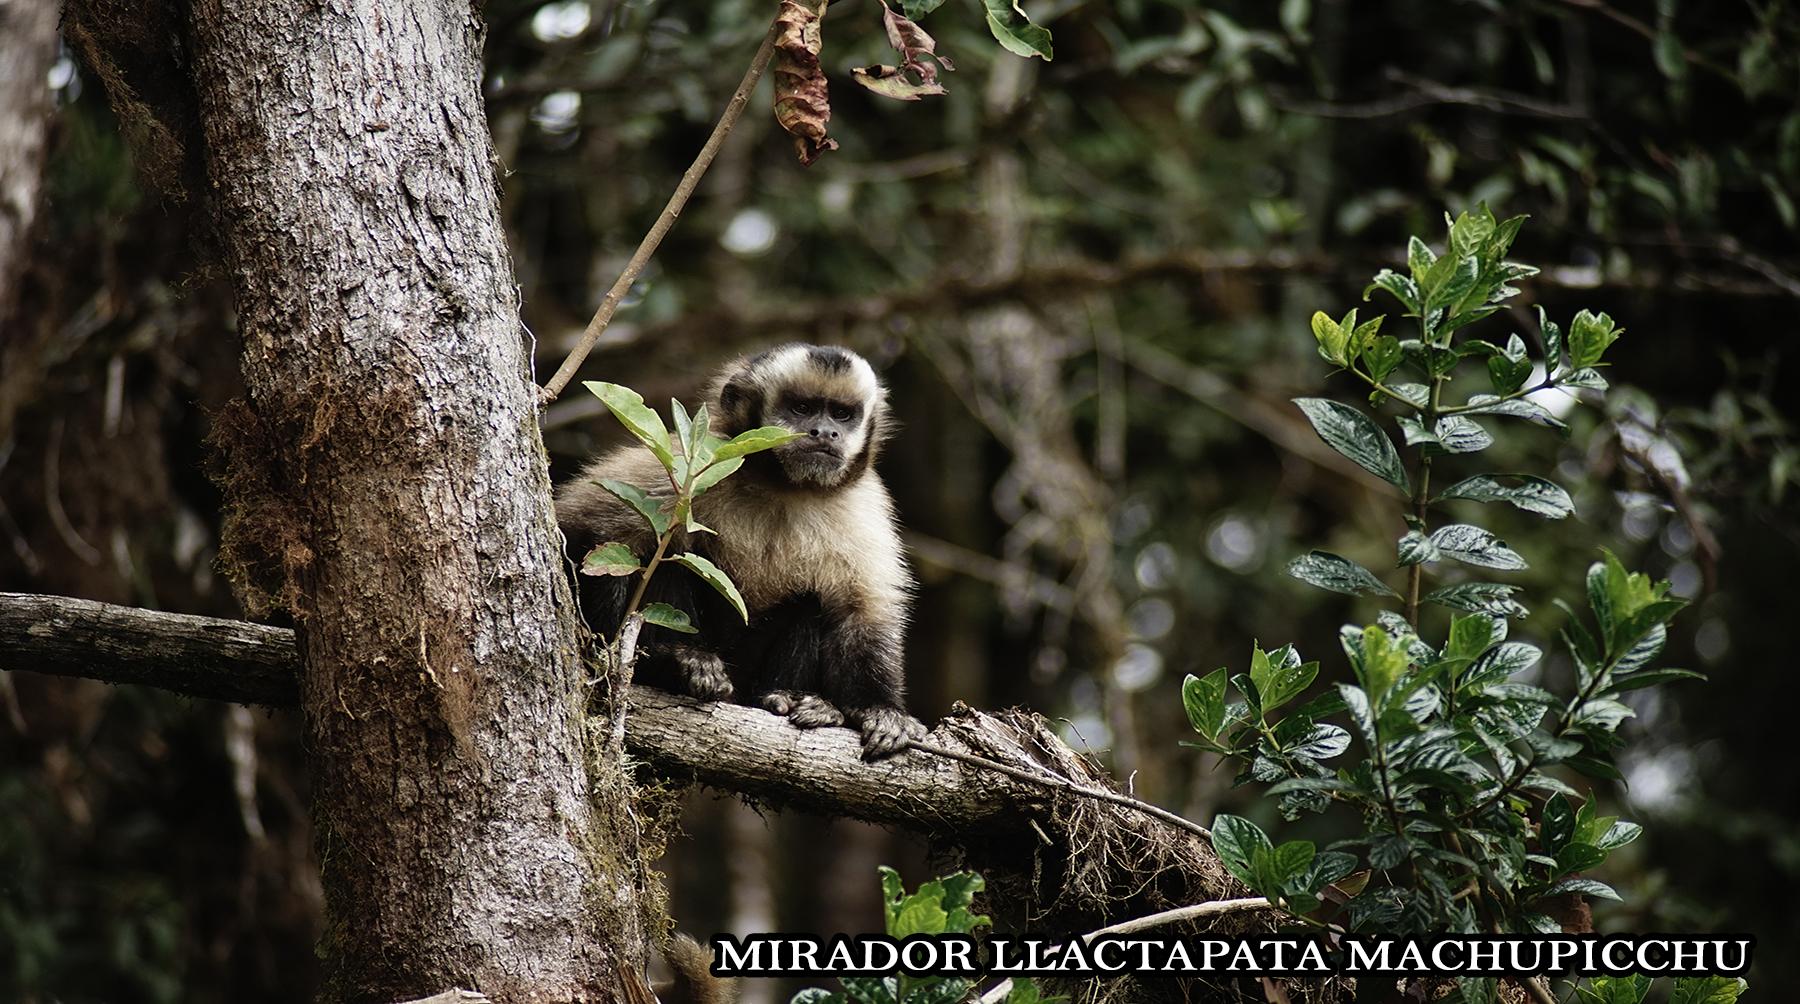 mono capuchino llactapata machu picchu